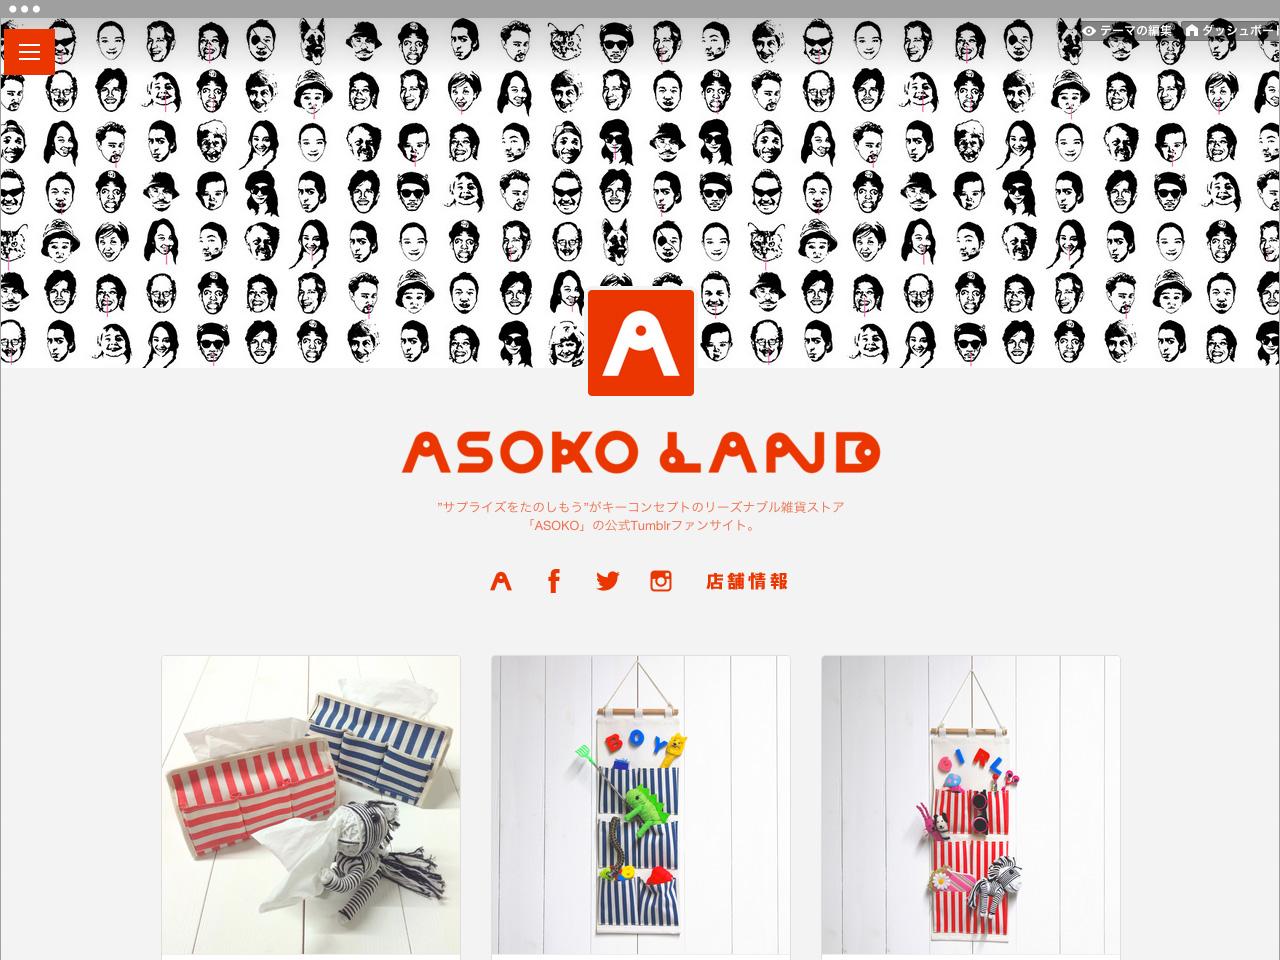 asoko web1 ASOKO ブランドファンサイト